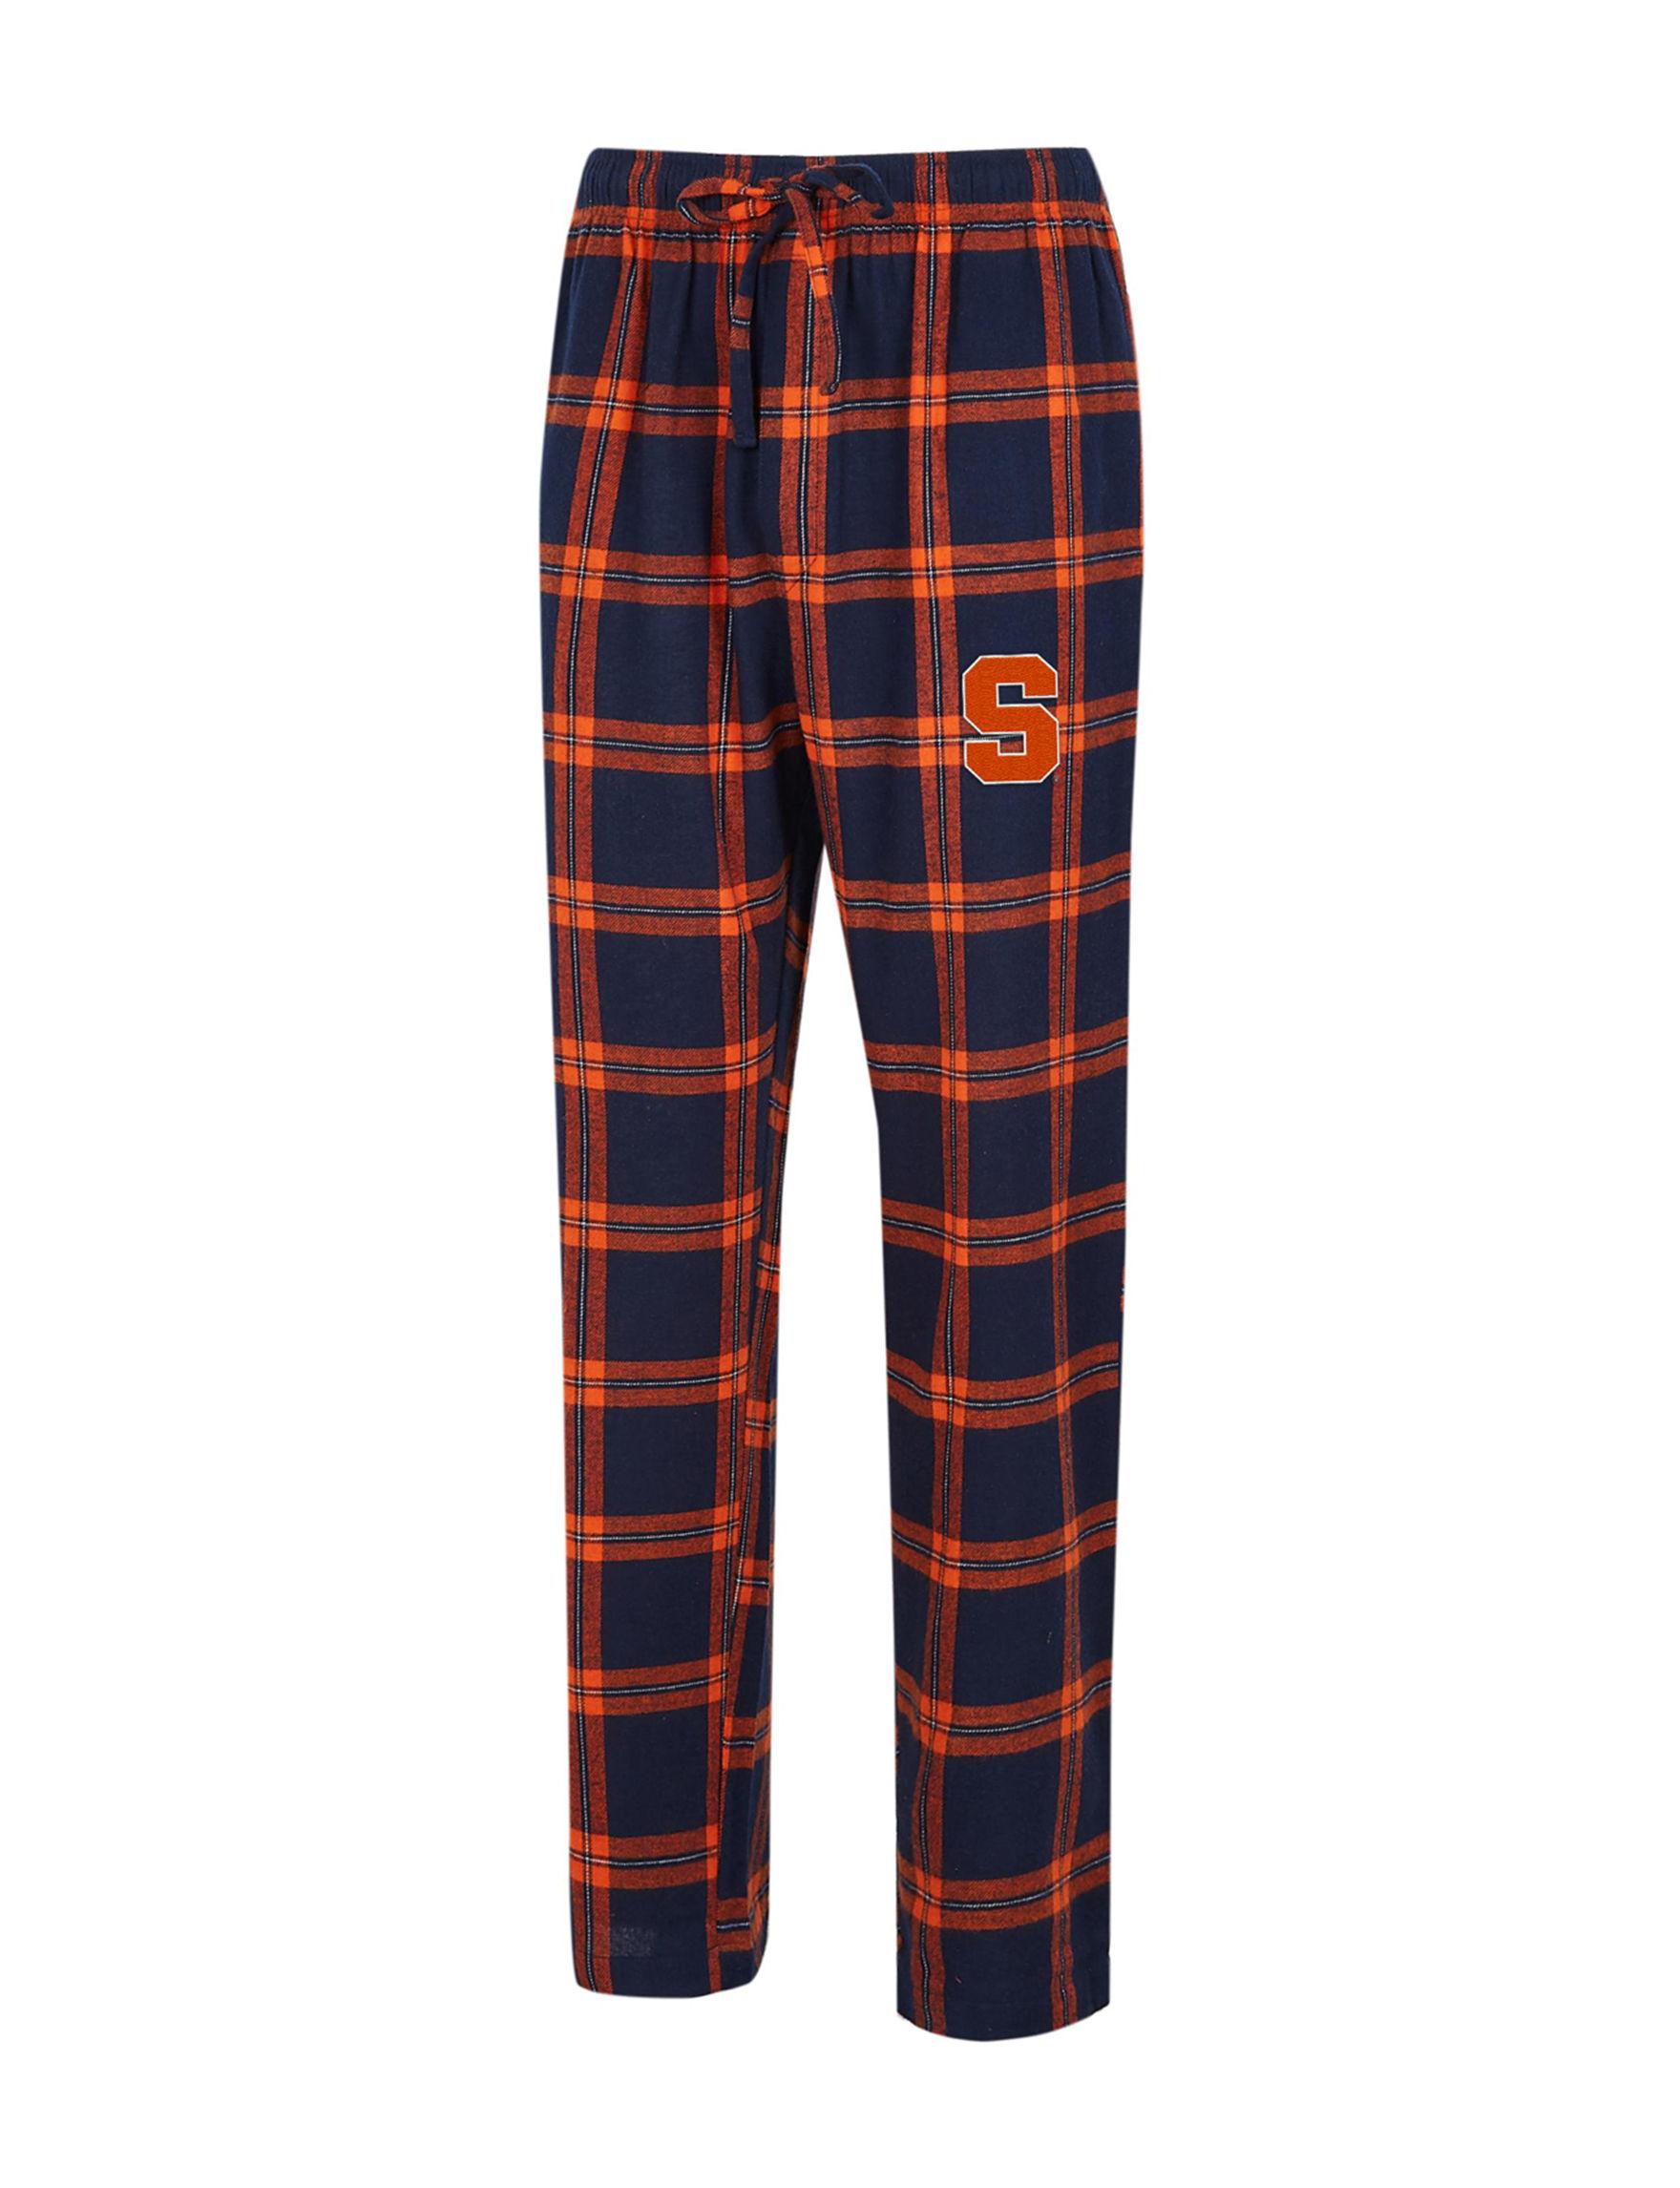 NCAA Navy / Orange Pajama Bottoms